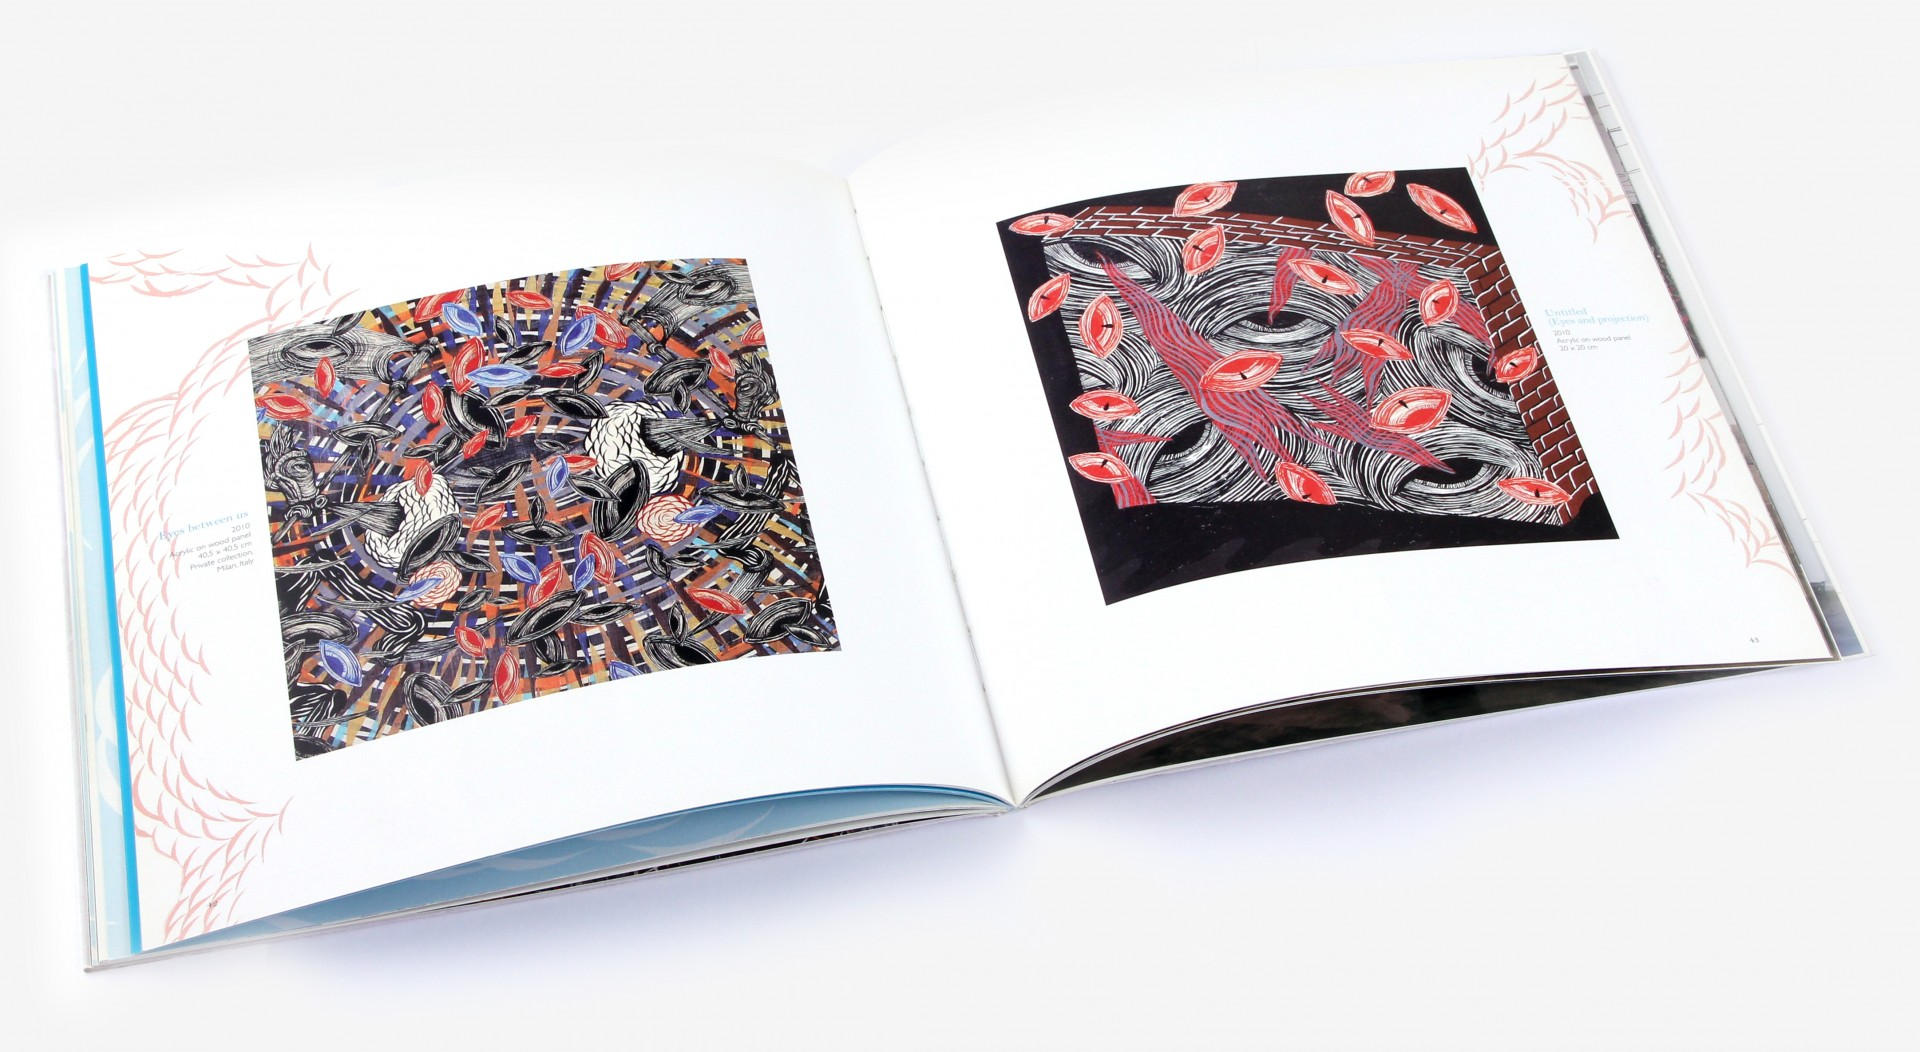 Andrew Shoultz - Crisis - Catalogo artista - interno